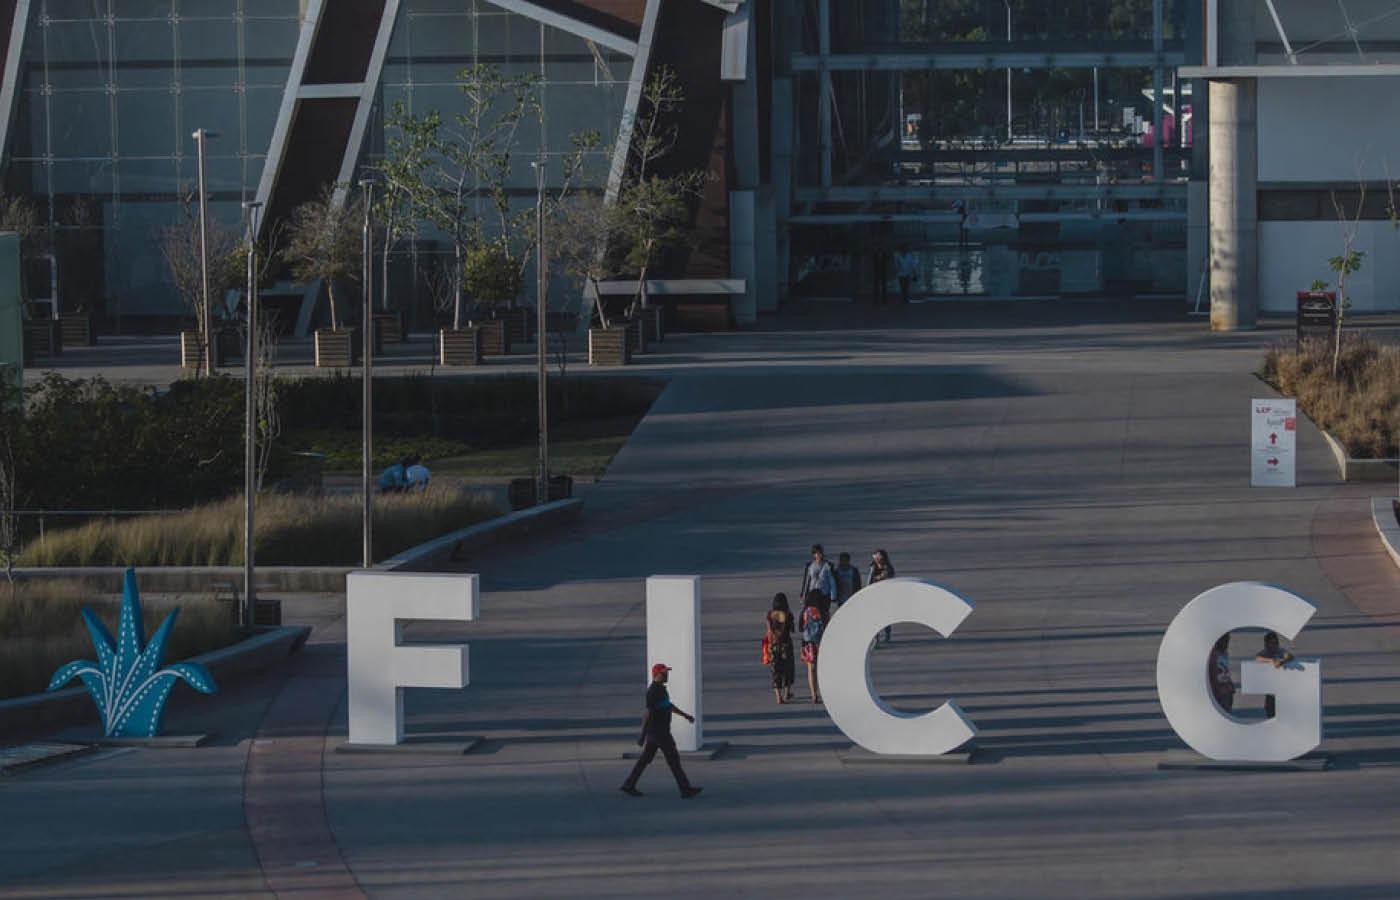 El Festival de cine de Guadalajara inicia de manera híbrida